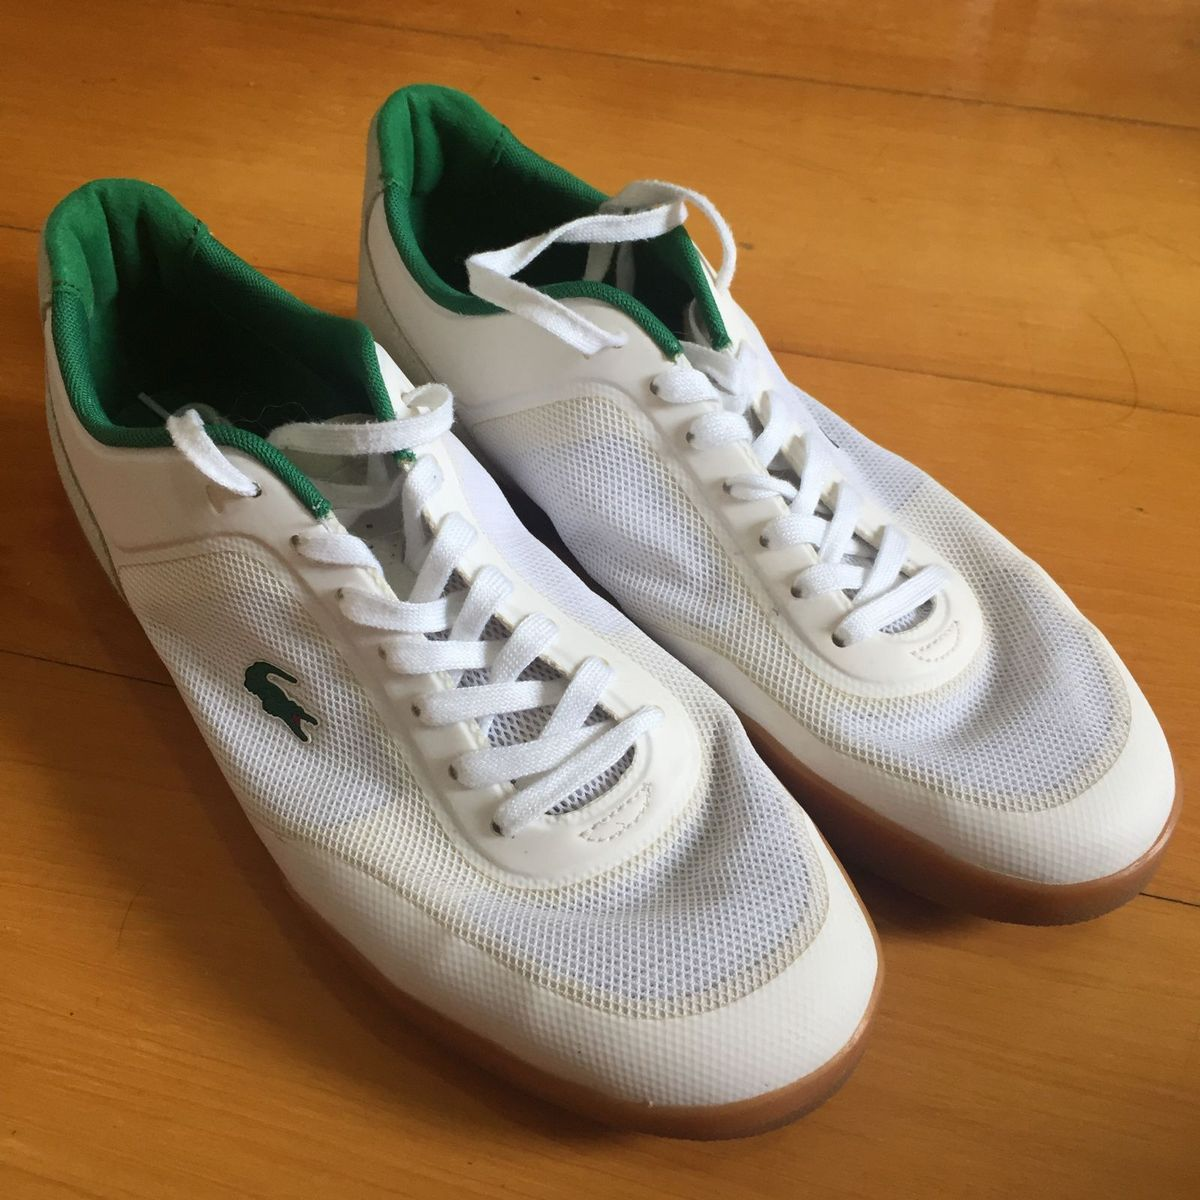 0ccff0b4fda4a Tenis Lacoste Original Branco e Verde